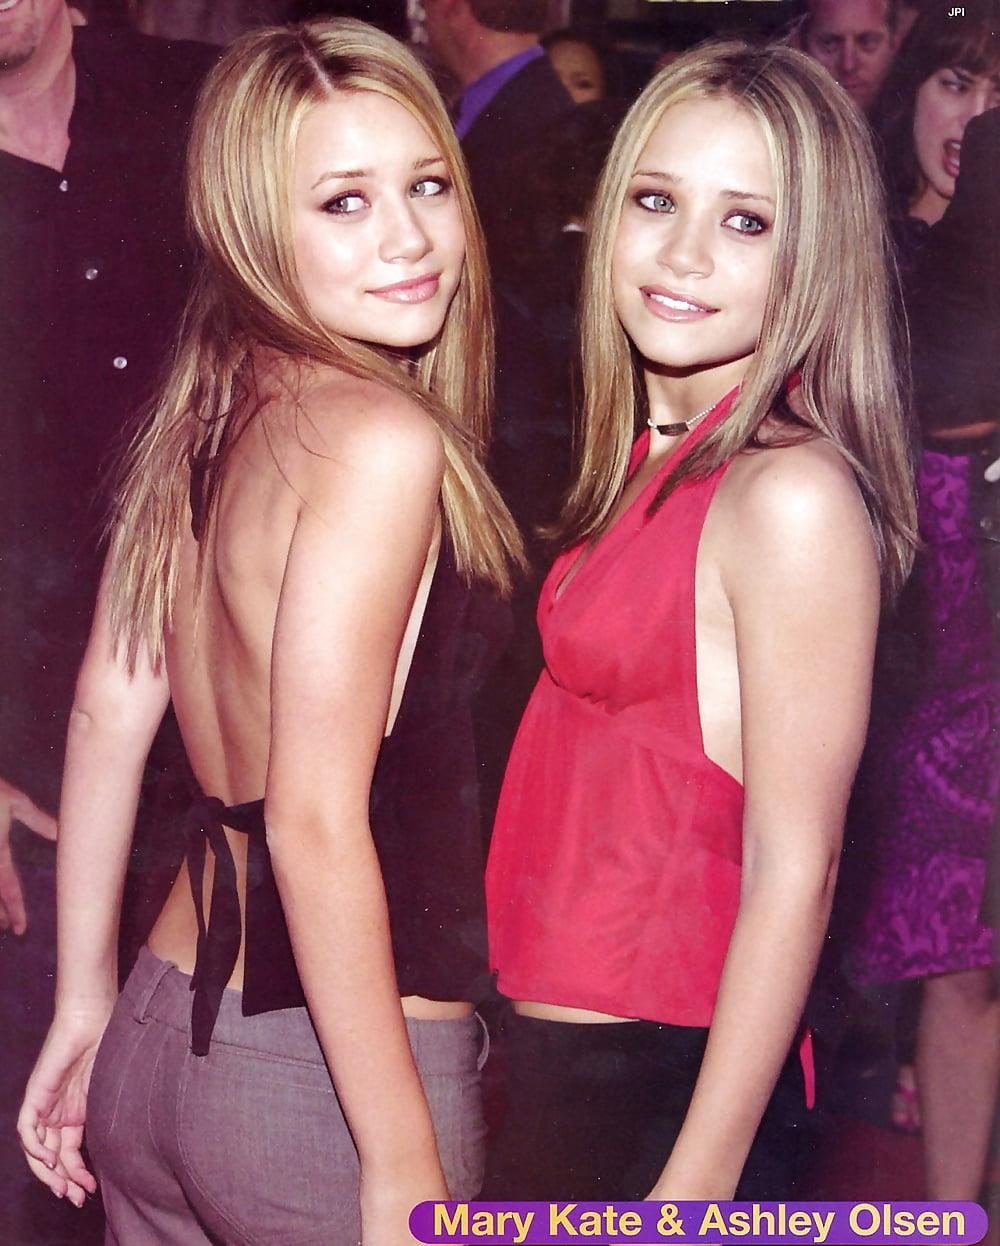 Ashley Olsen And Mary